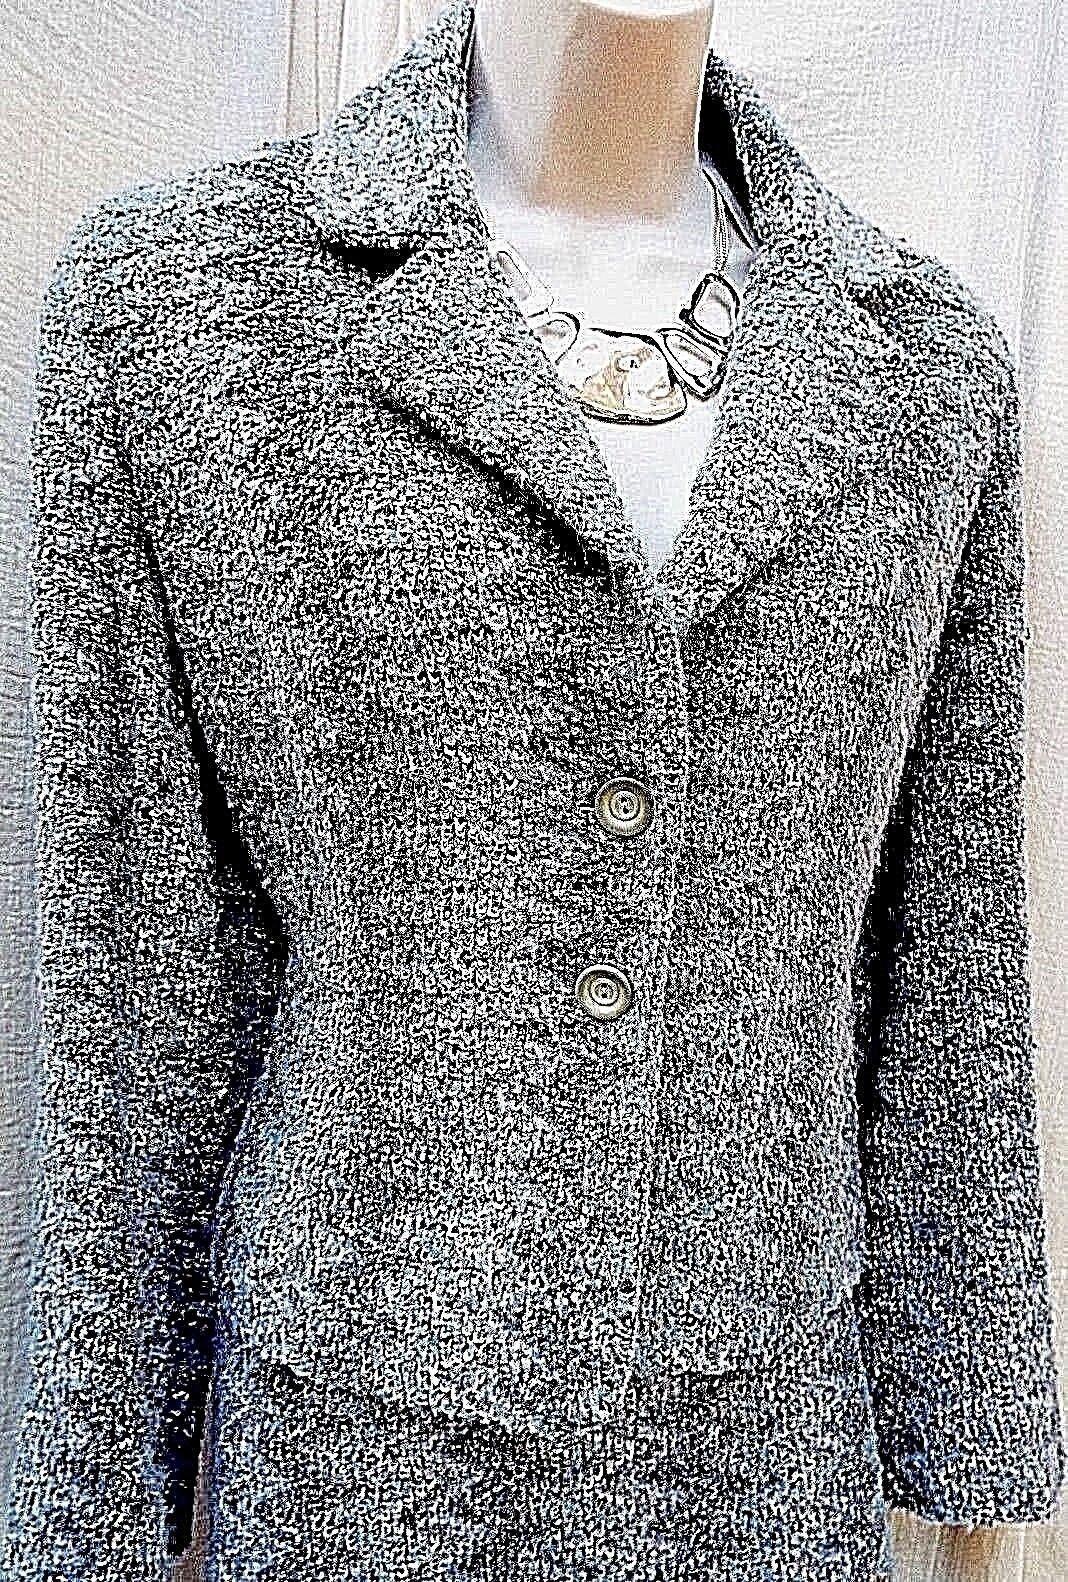 MICHEL MICHEL MICHEL AMBERS Tweed Wool & Silk Blend 2 Pezzi Giacca e Gonna SZ 12 Grigio Mix 0ff22b